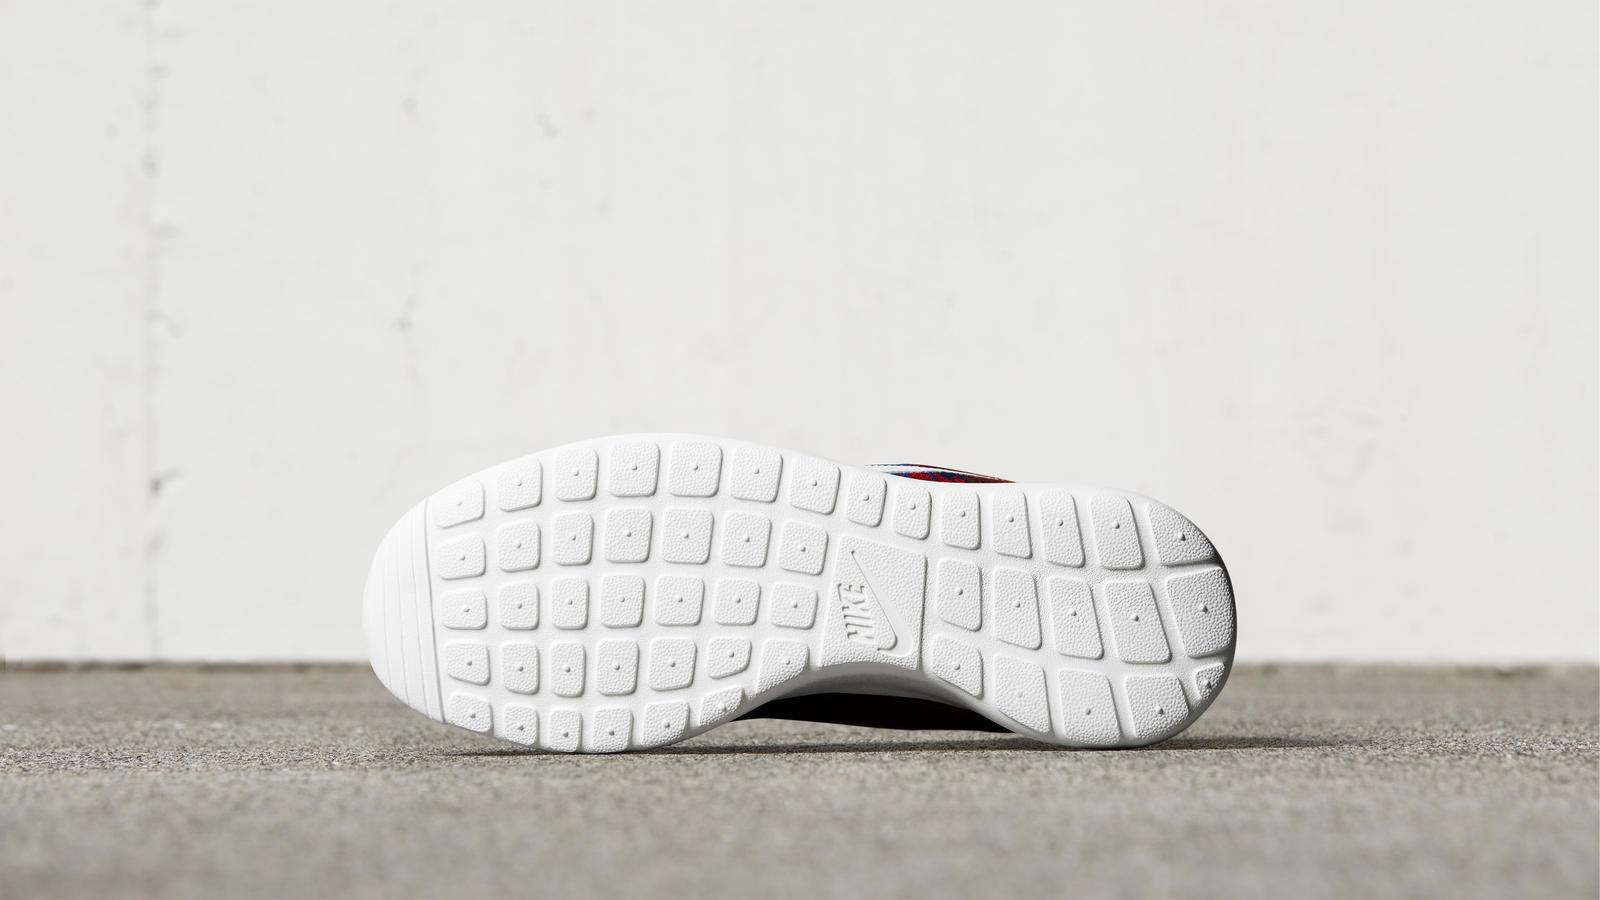 Nike Roshe One Premium Pendleton iD